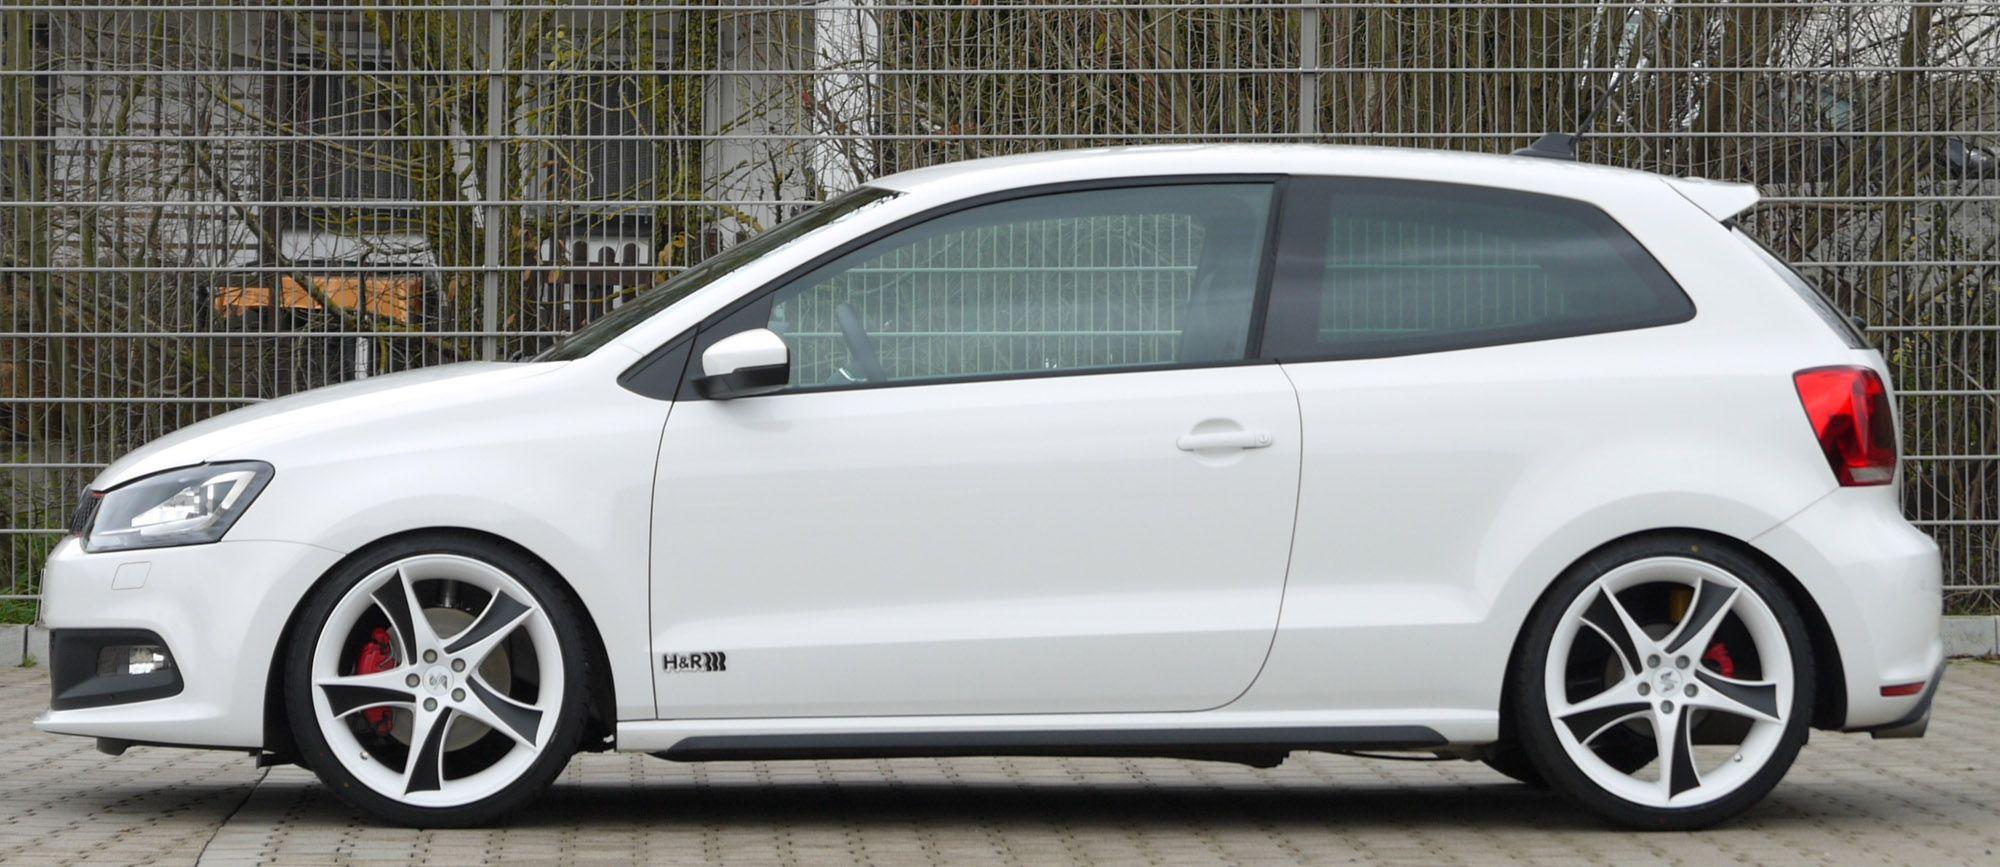 Volkswagen polo 2010 model araba resimleri - Volkswagen Polo White Google Search